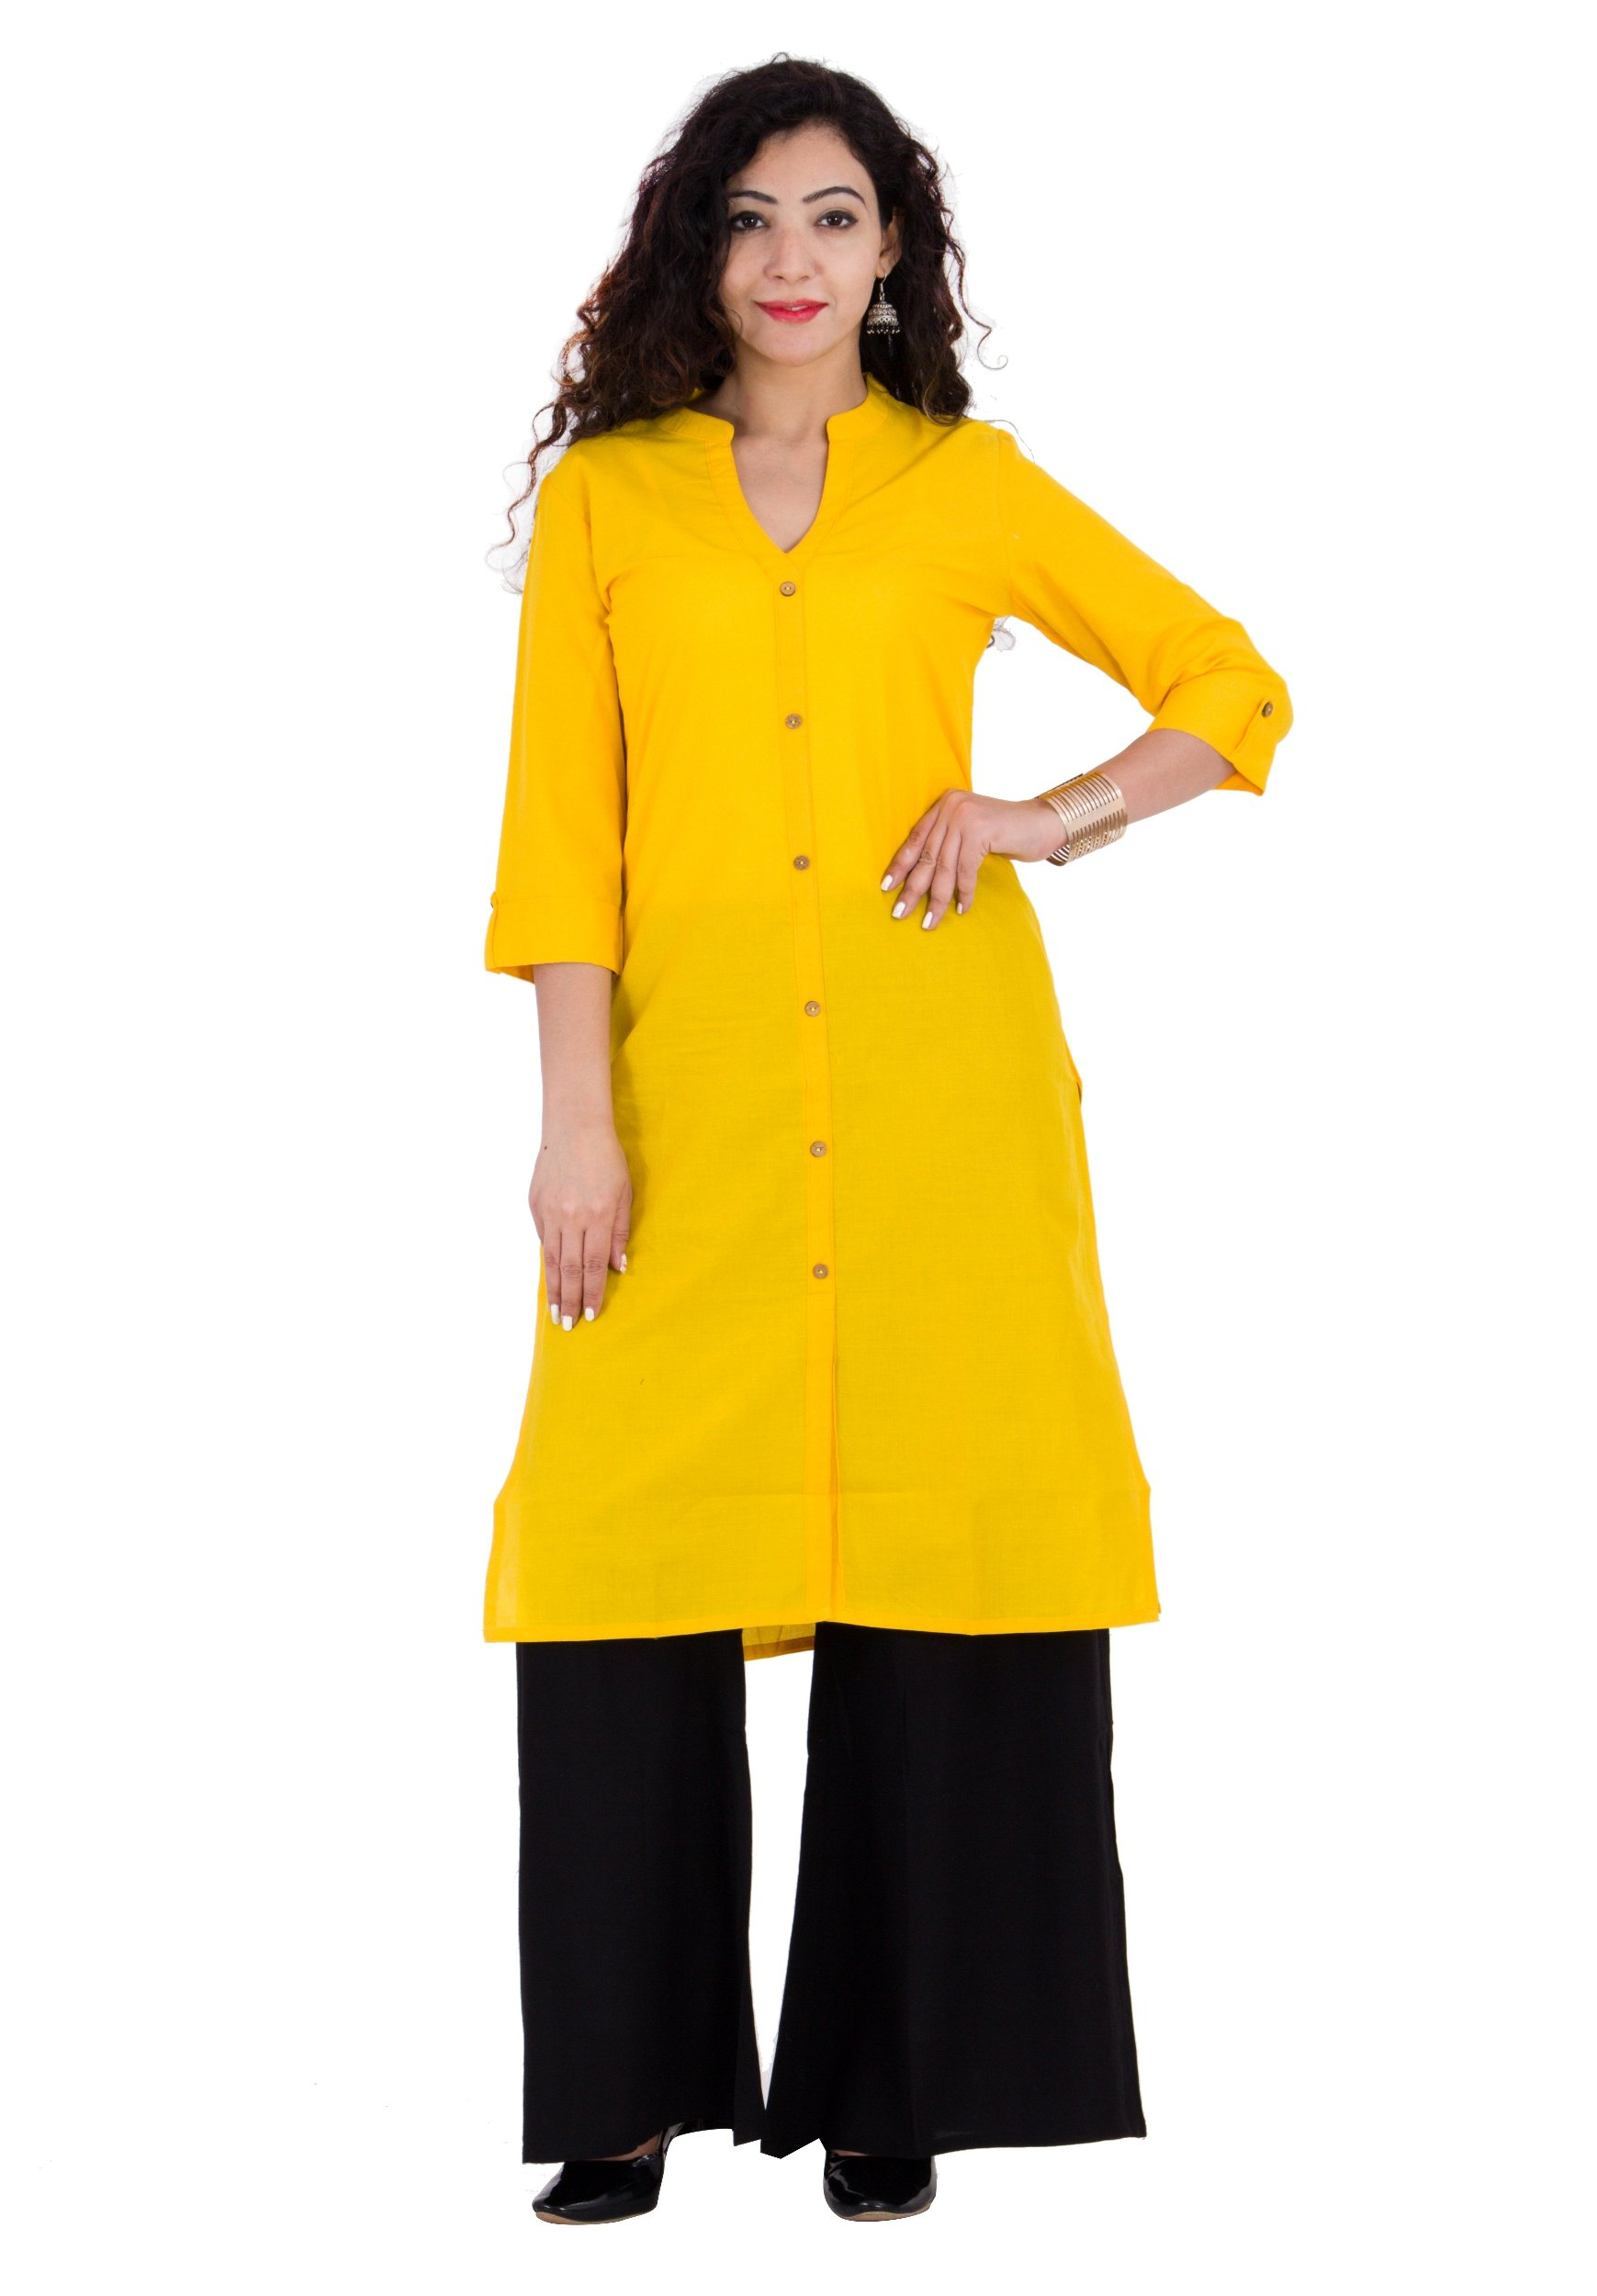 BrightJet Bollywood Yellow Cotton Frontslit Women Fashion Kurti A-Line Kurta Top Tunic With Rayon Solid Black Plazzo Set Party Dress Casual (XXL)